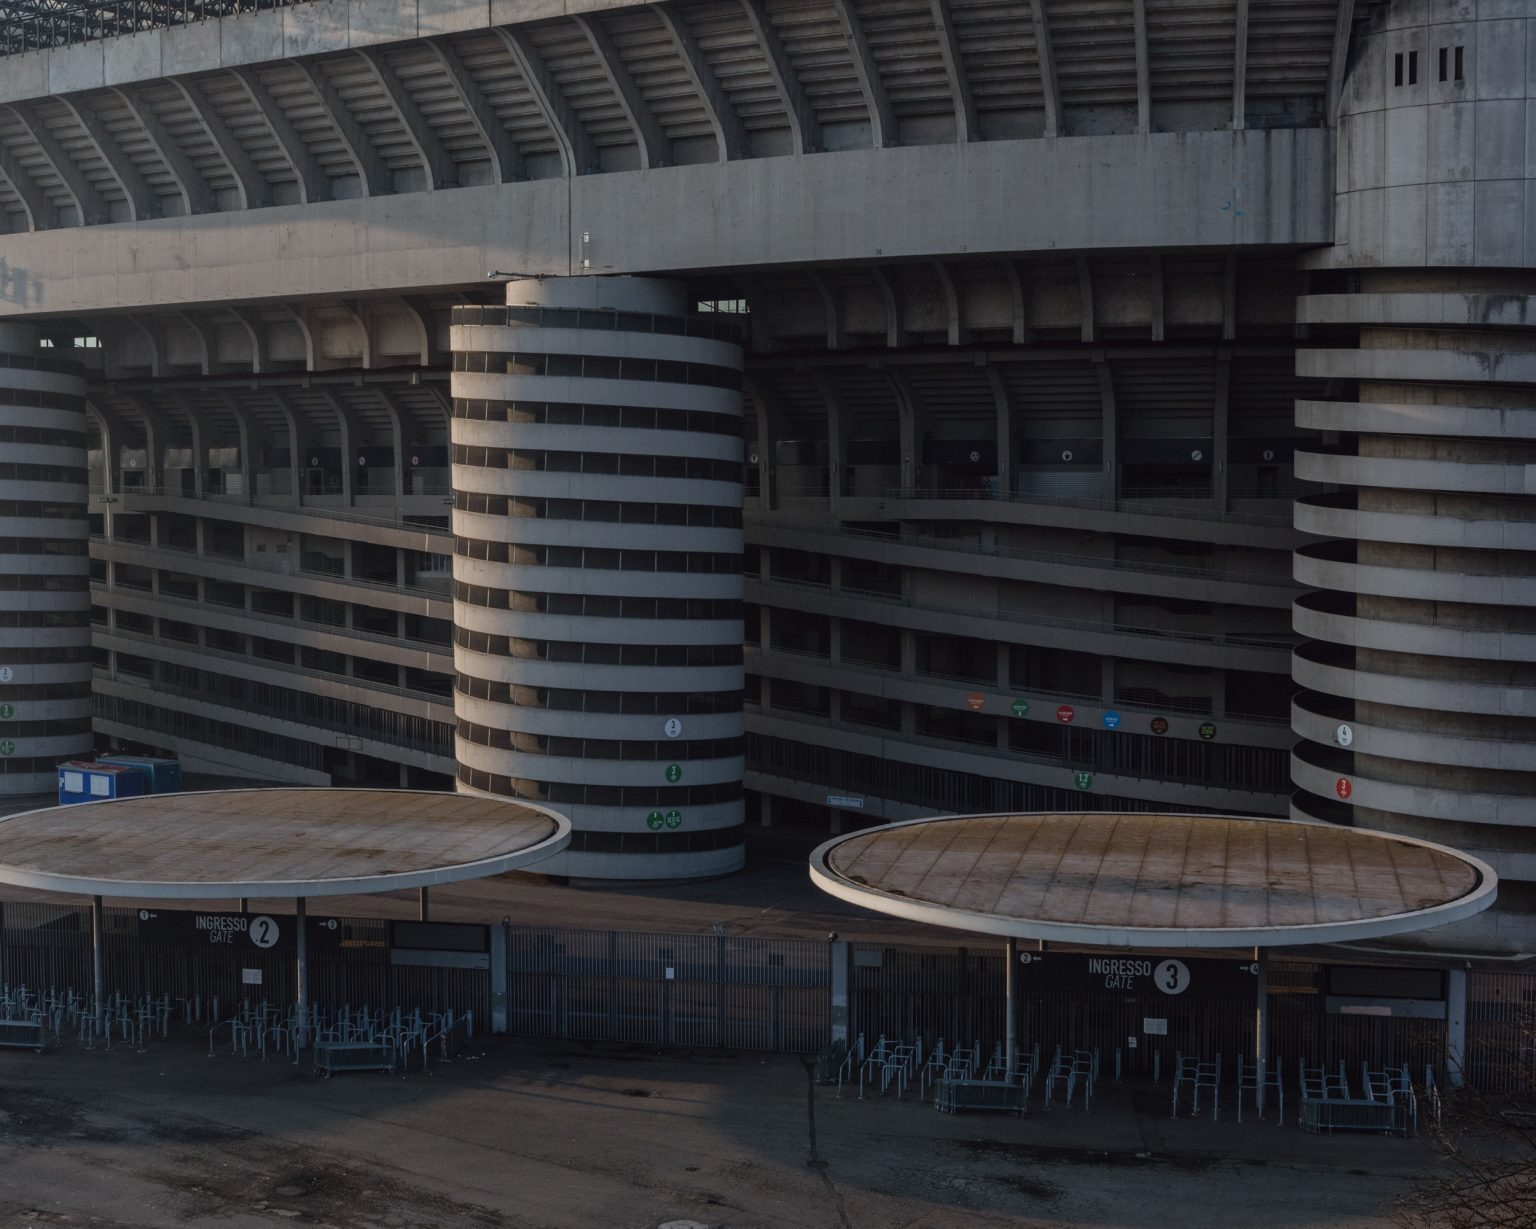 stadio-giuseppe-meazza-san-siro-milano